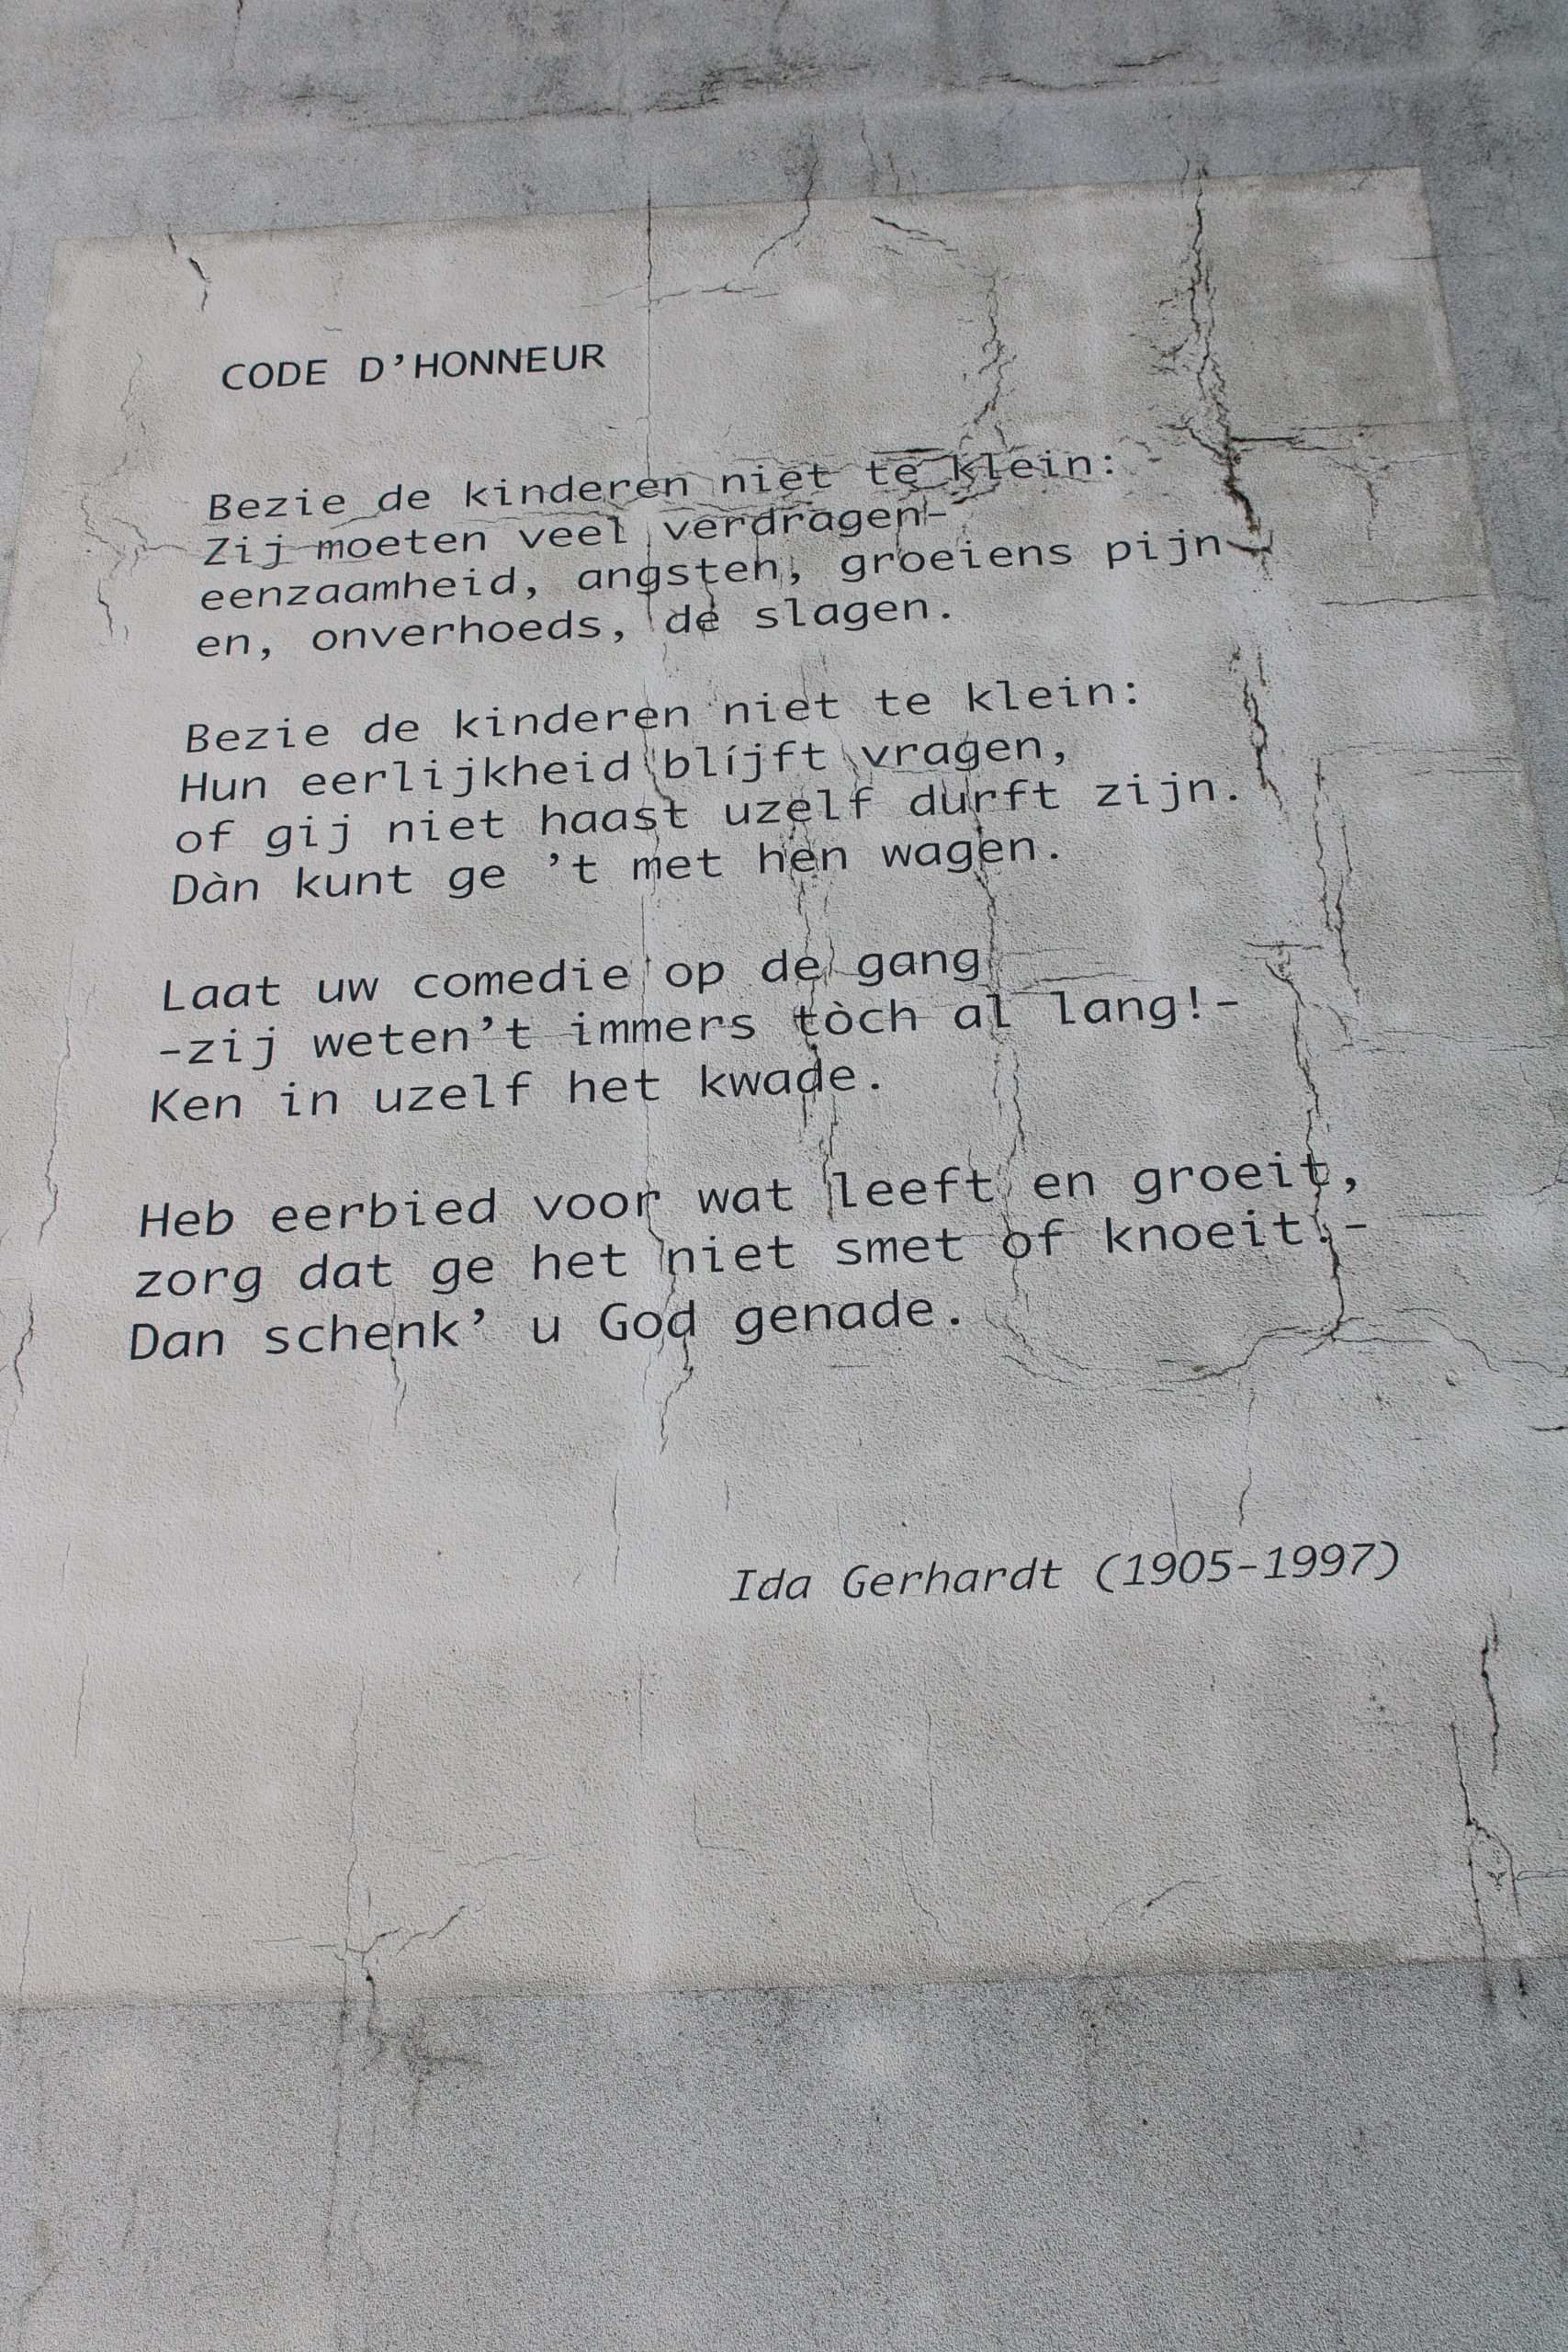 Poem by I. Gerhardt